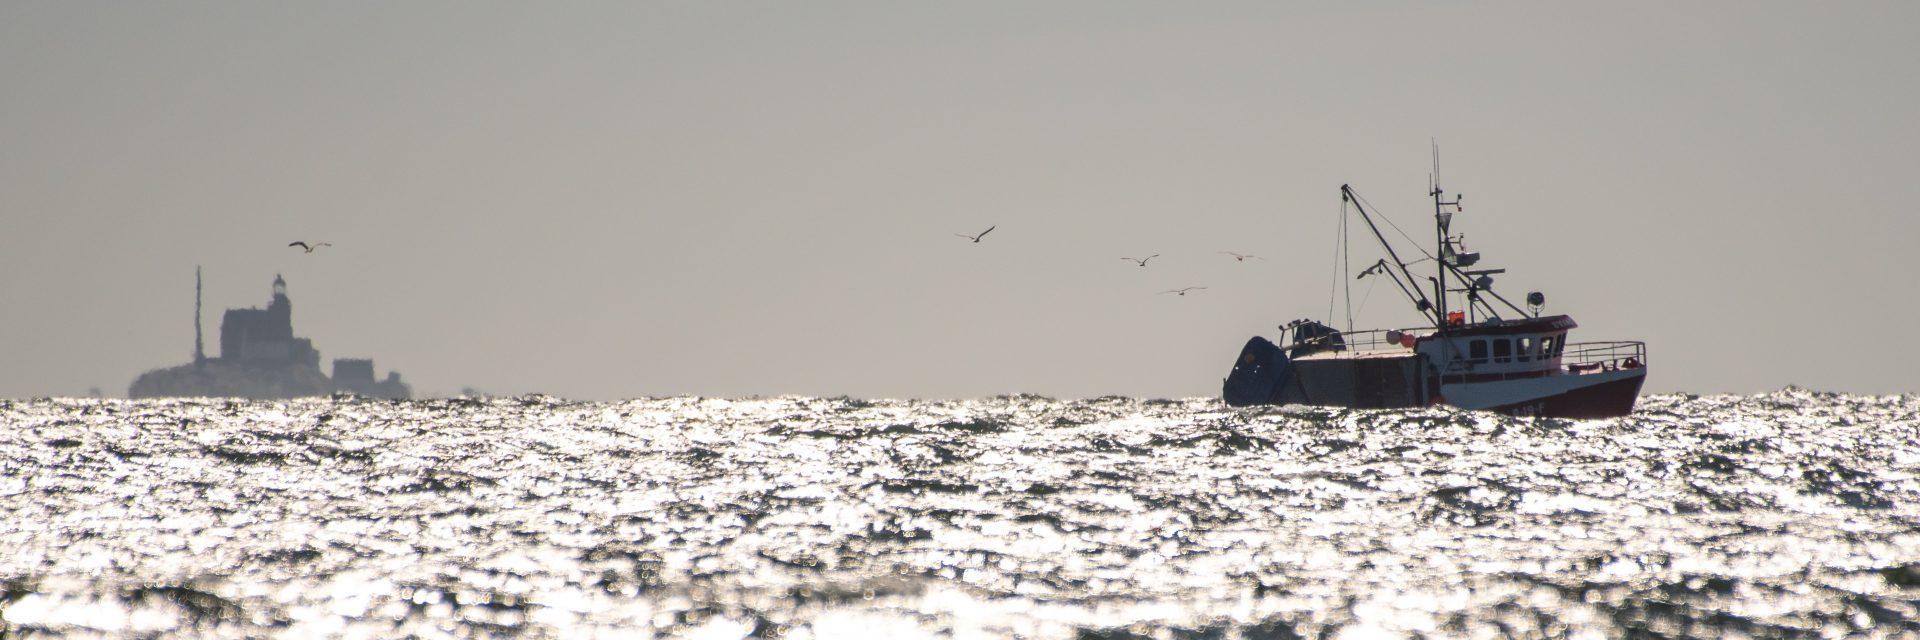 Torsbjørnskjær - til Utgådskilen med fangst